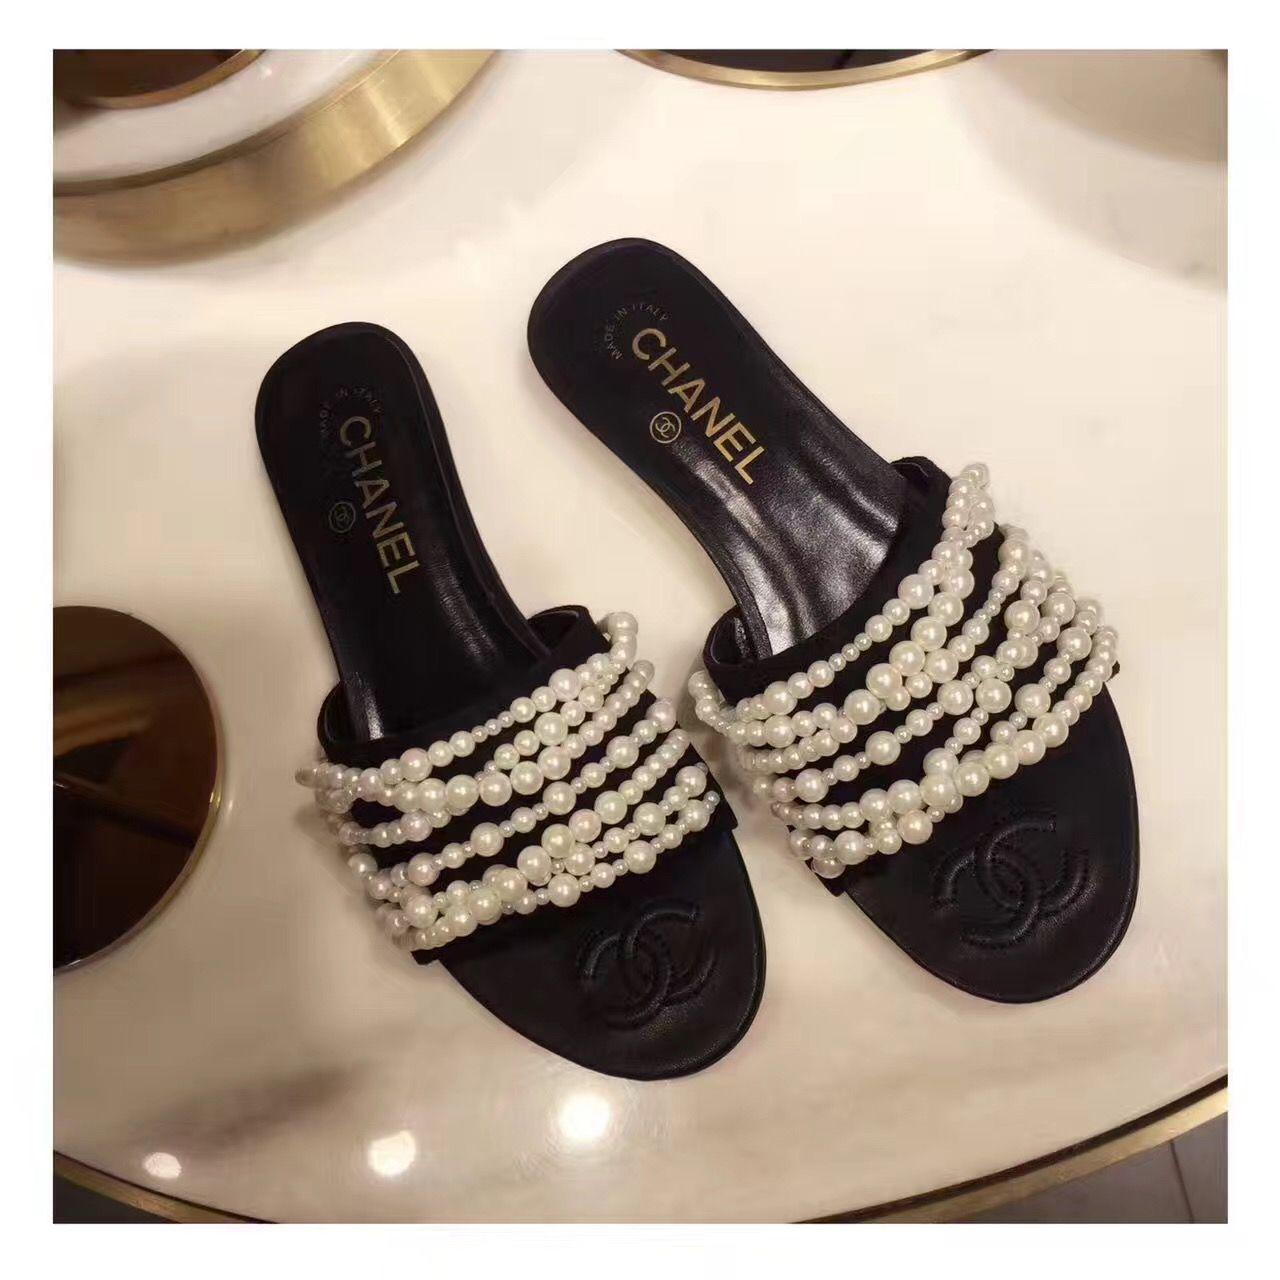 d6d070d77cb6 Chanel woman shoes pearls chain design slippers sandals